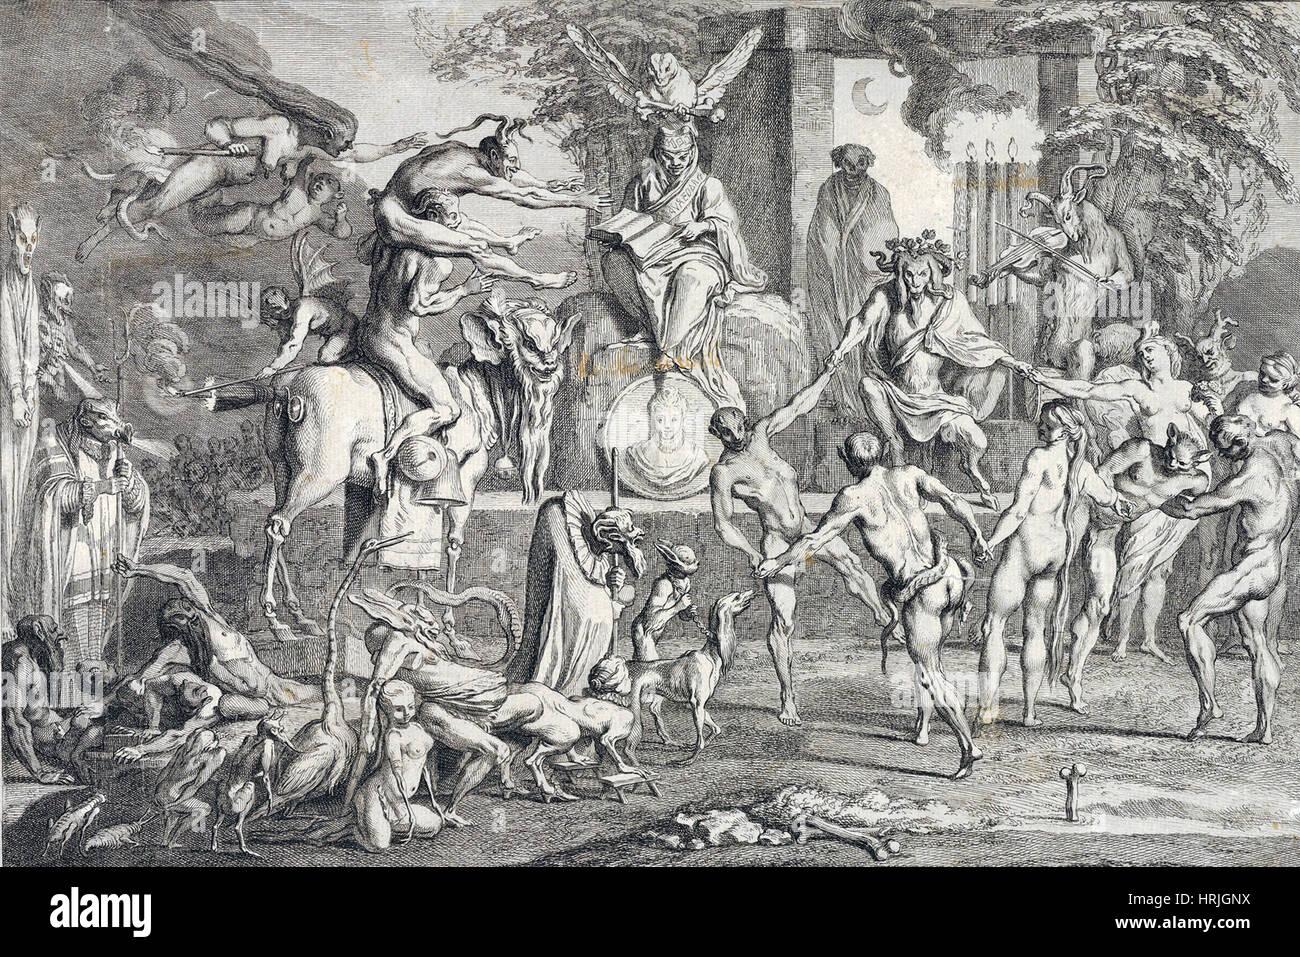 Witches' Sabbath, 18th Century - Stock Image